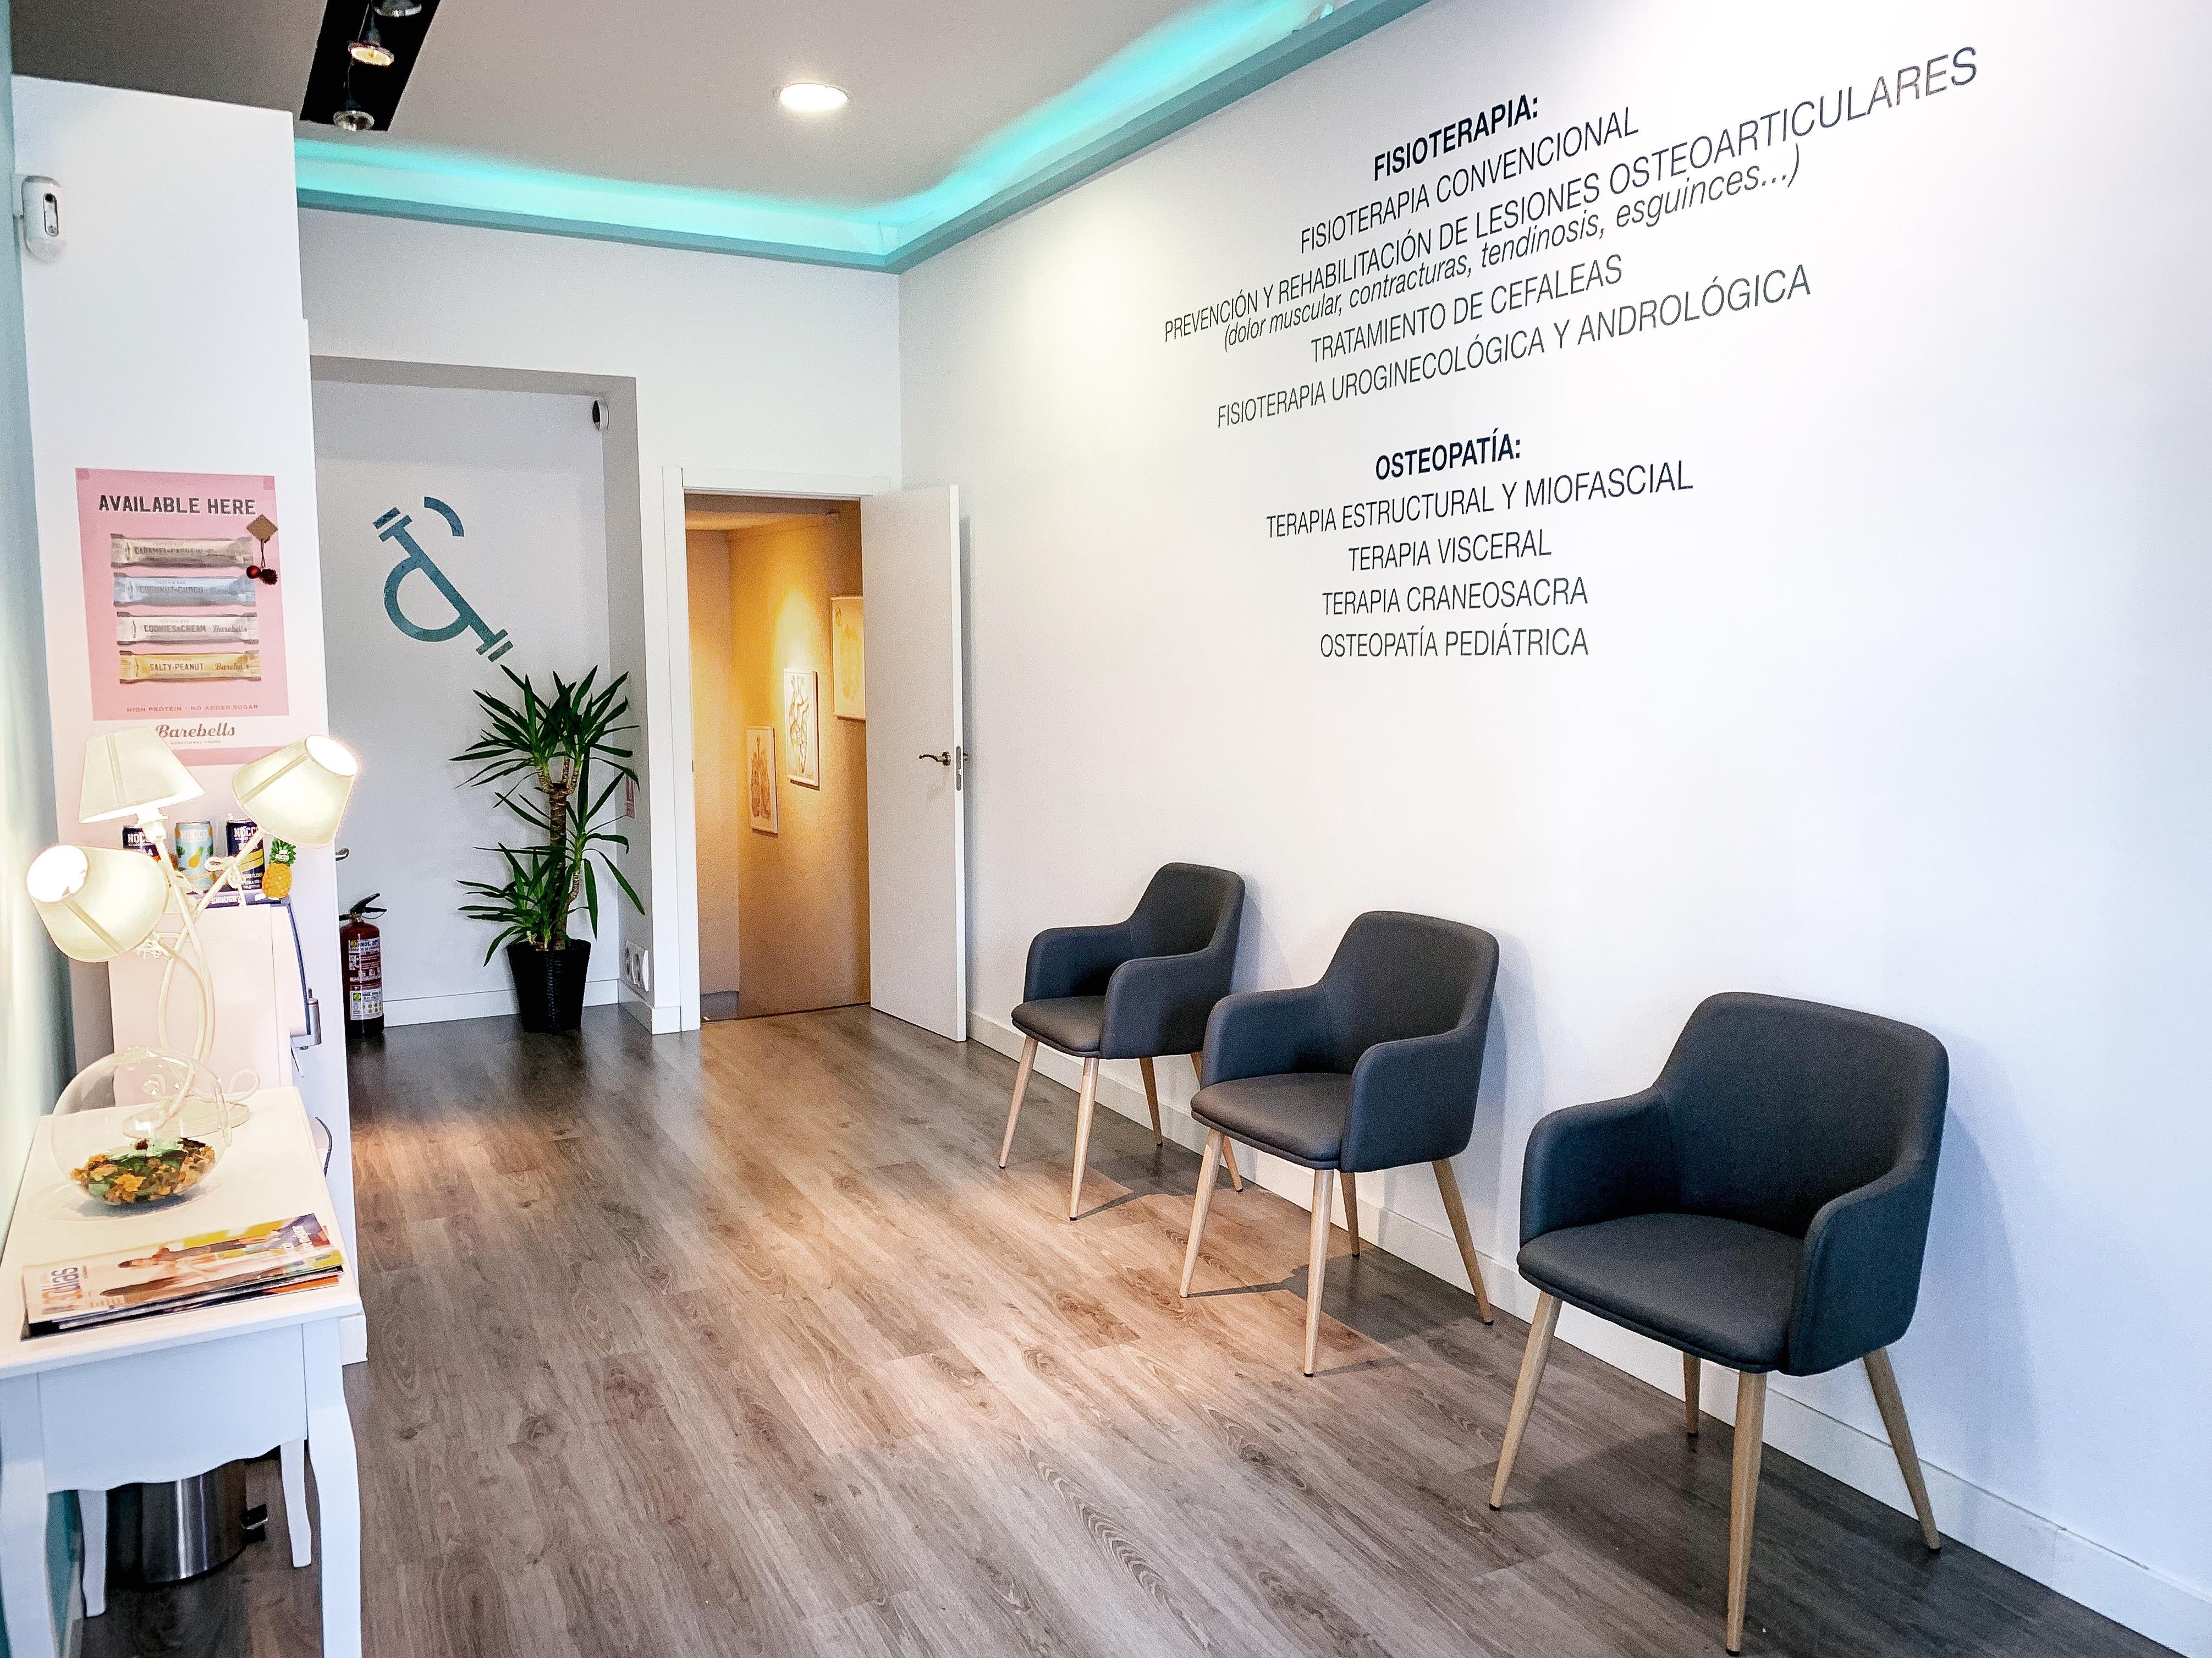 Centro especializado en fisioterapia & osteopatía en Plza Castilla, Madrid